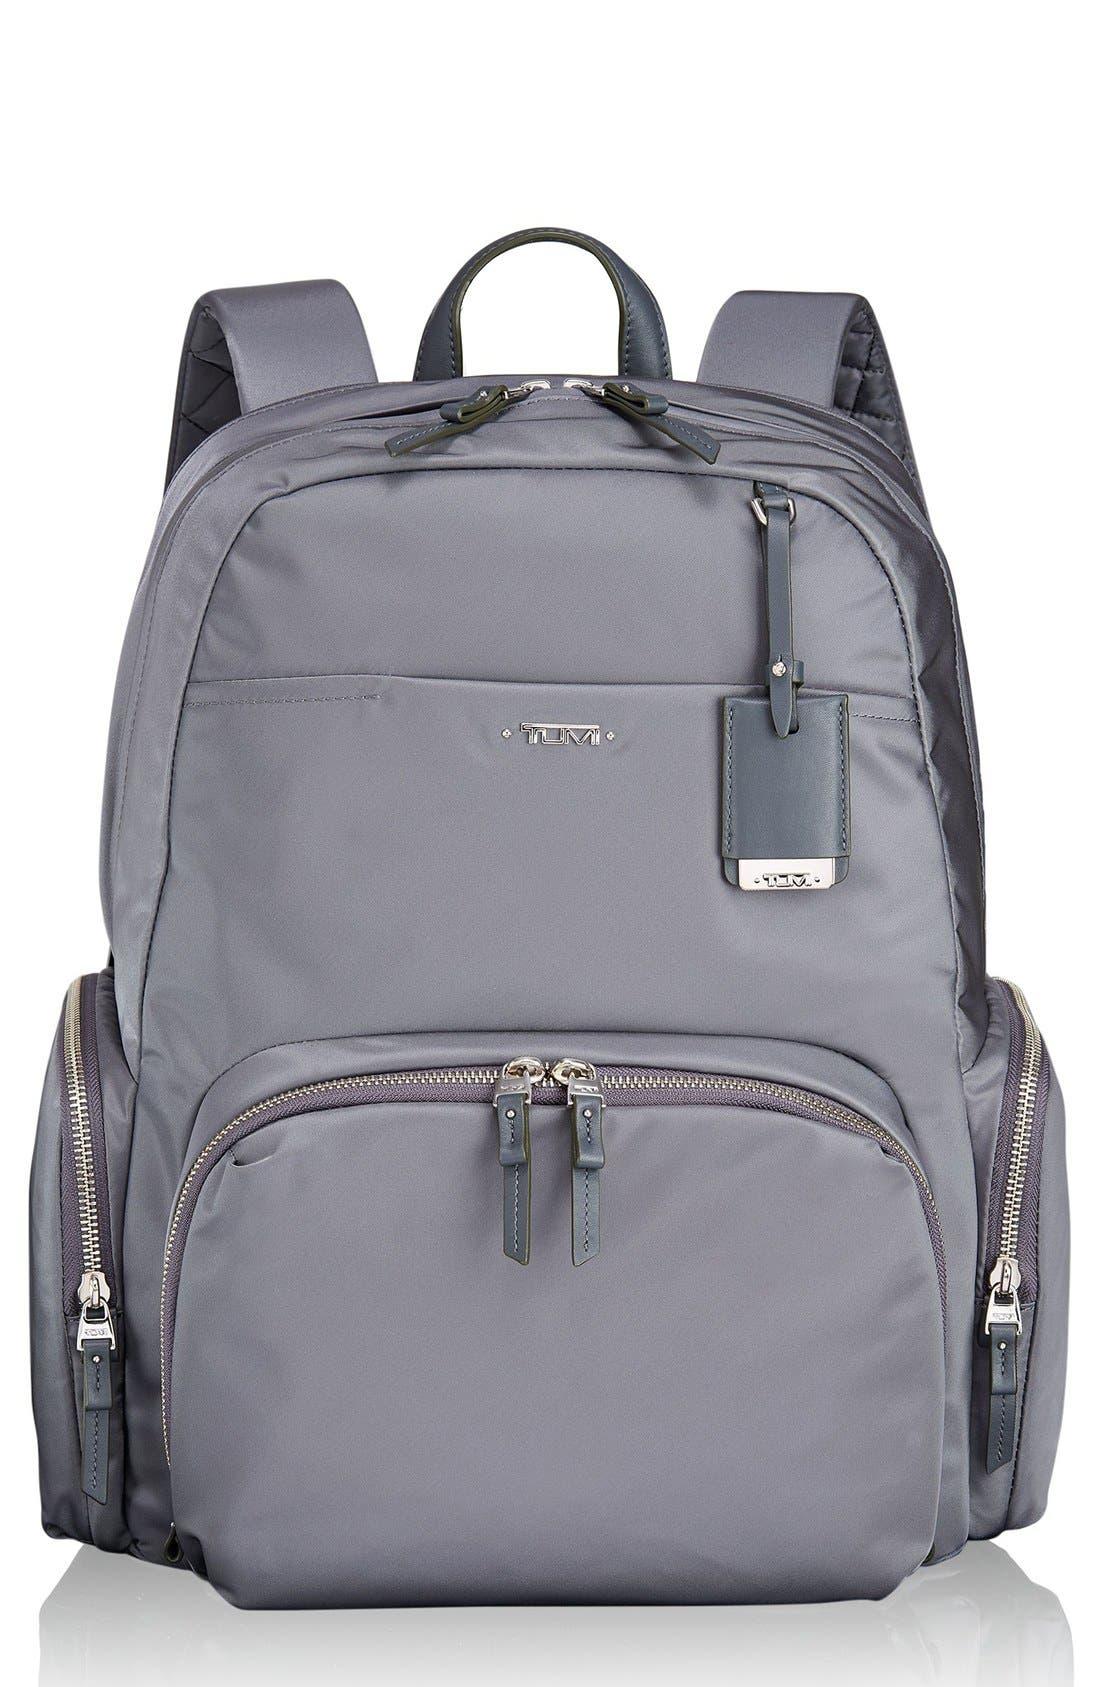 Alternate Image 1 Selected - Tumi 'Voyageur - Calais' Nylon Computer Backpack